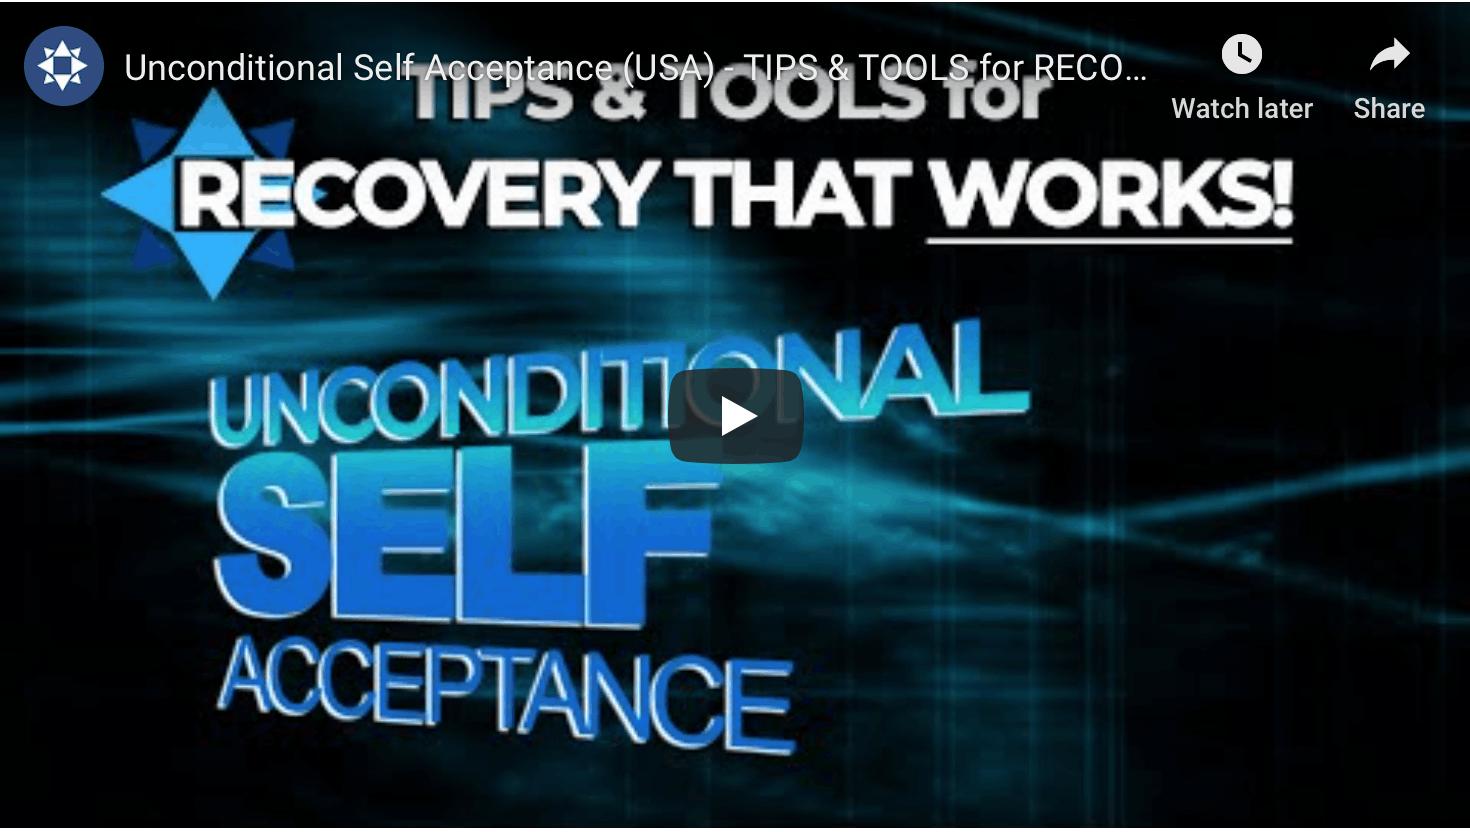 Unconditional Self Acceptance